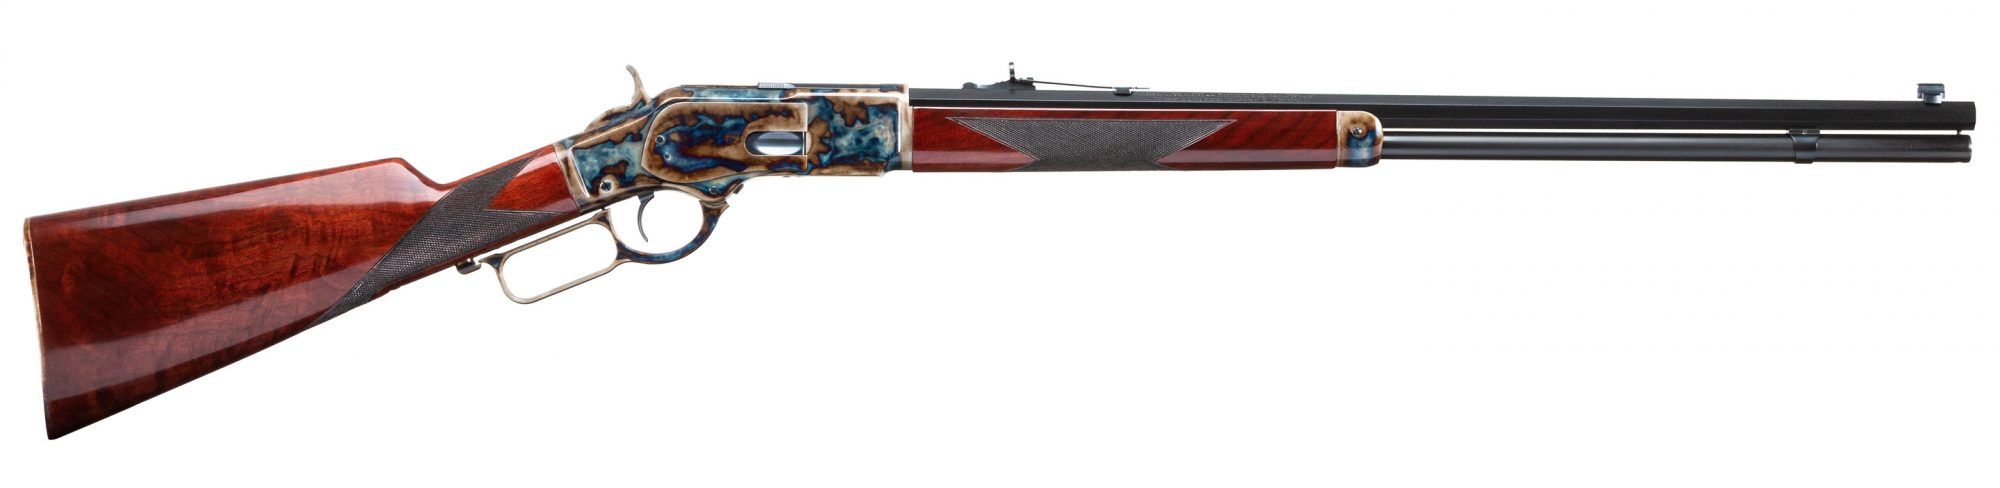 6541 Turnbull Winchester 1873 45 00105ZT73W